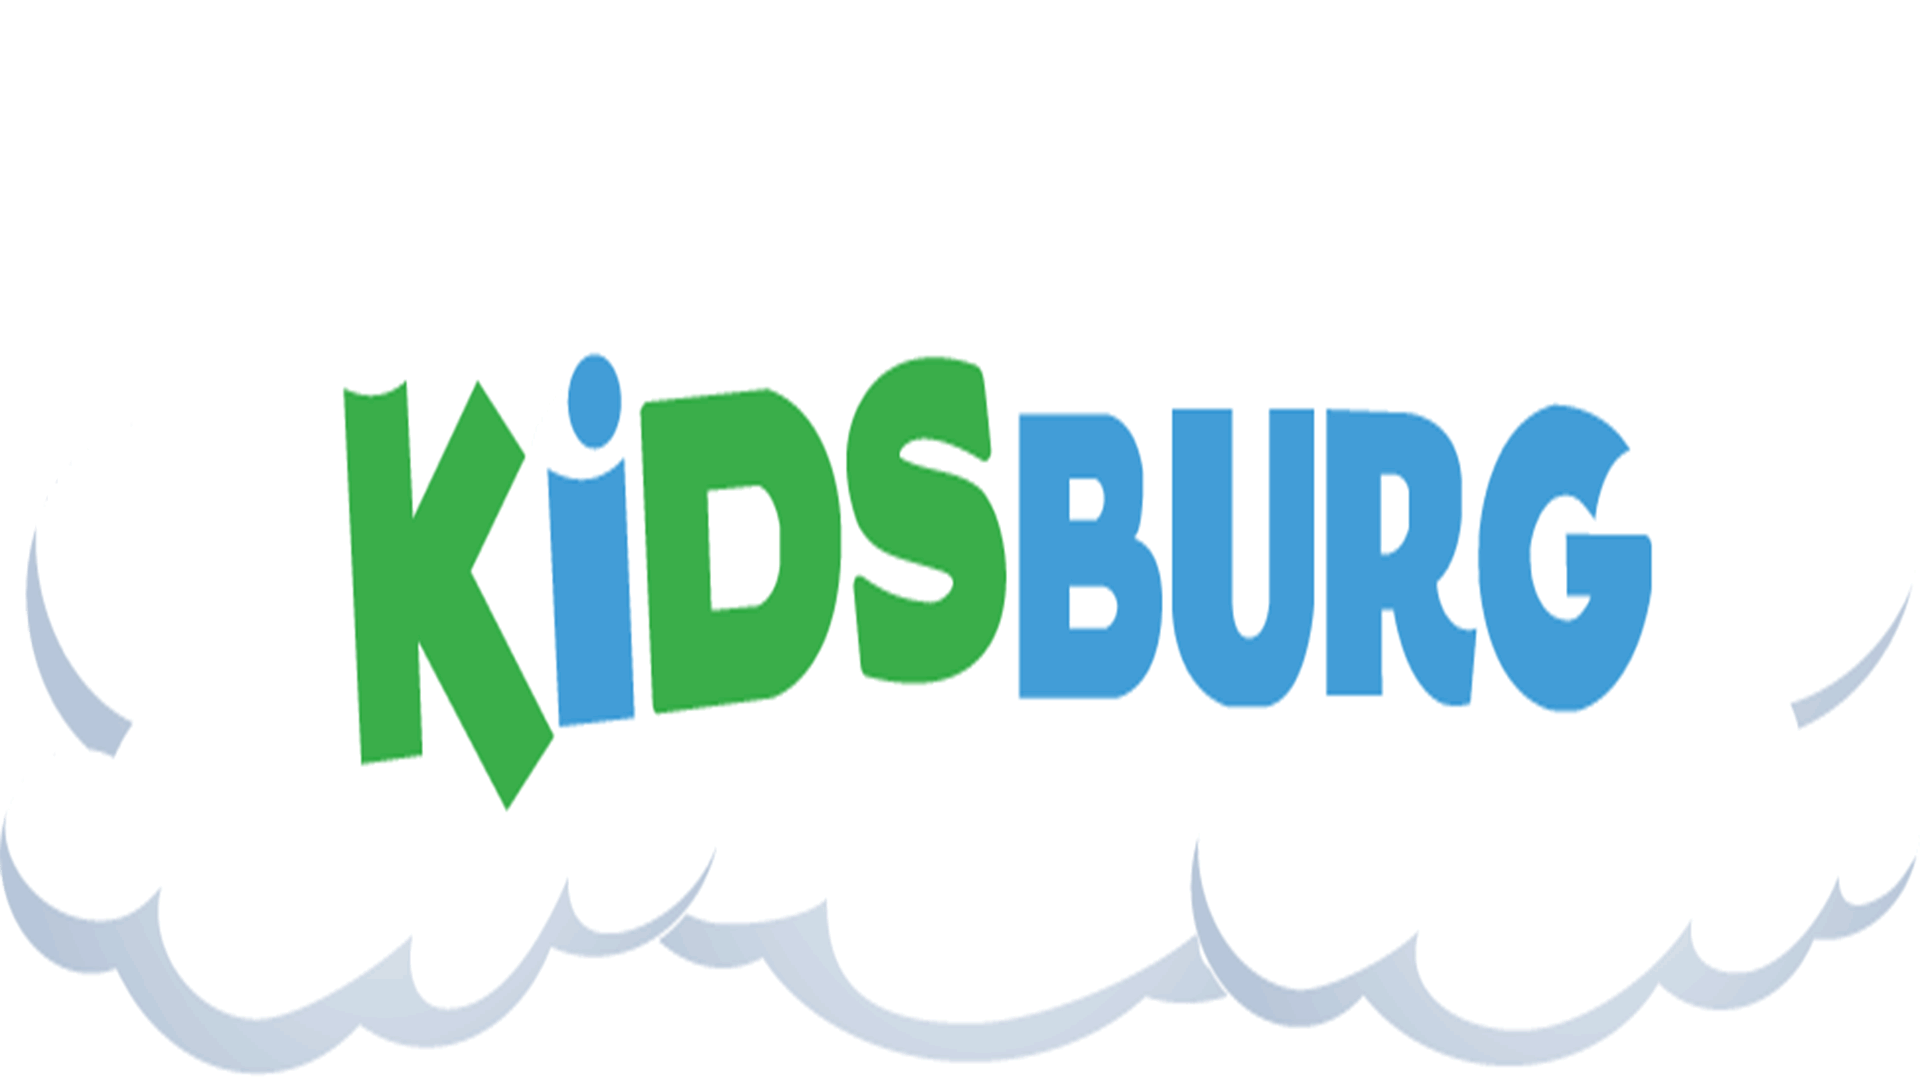 KIDSBURG: Saturday, August 16, 1:30pm – 6:30pm @ Forrest County Multi-purpose Center